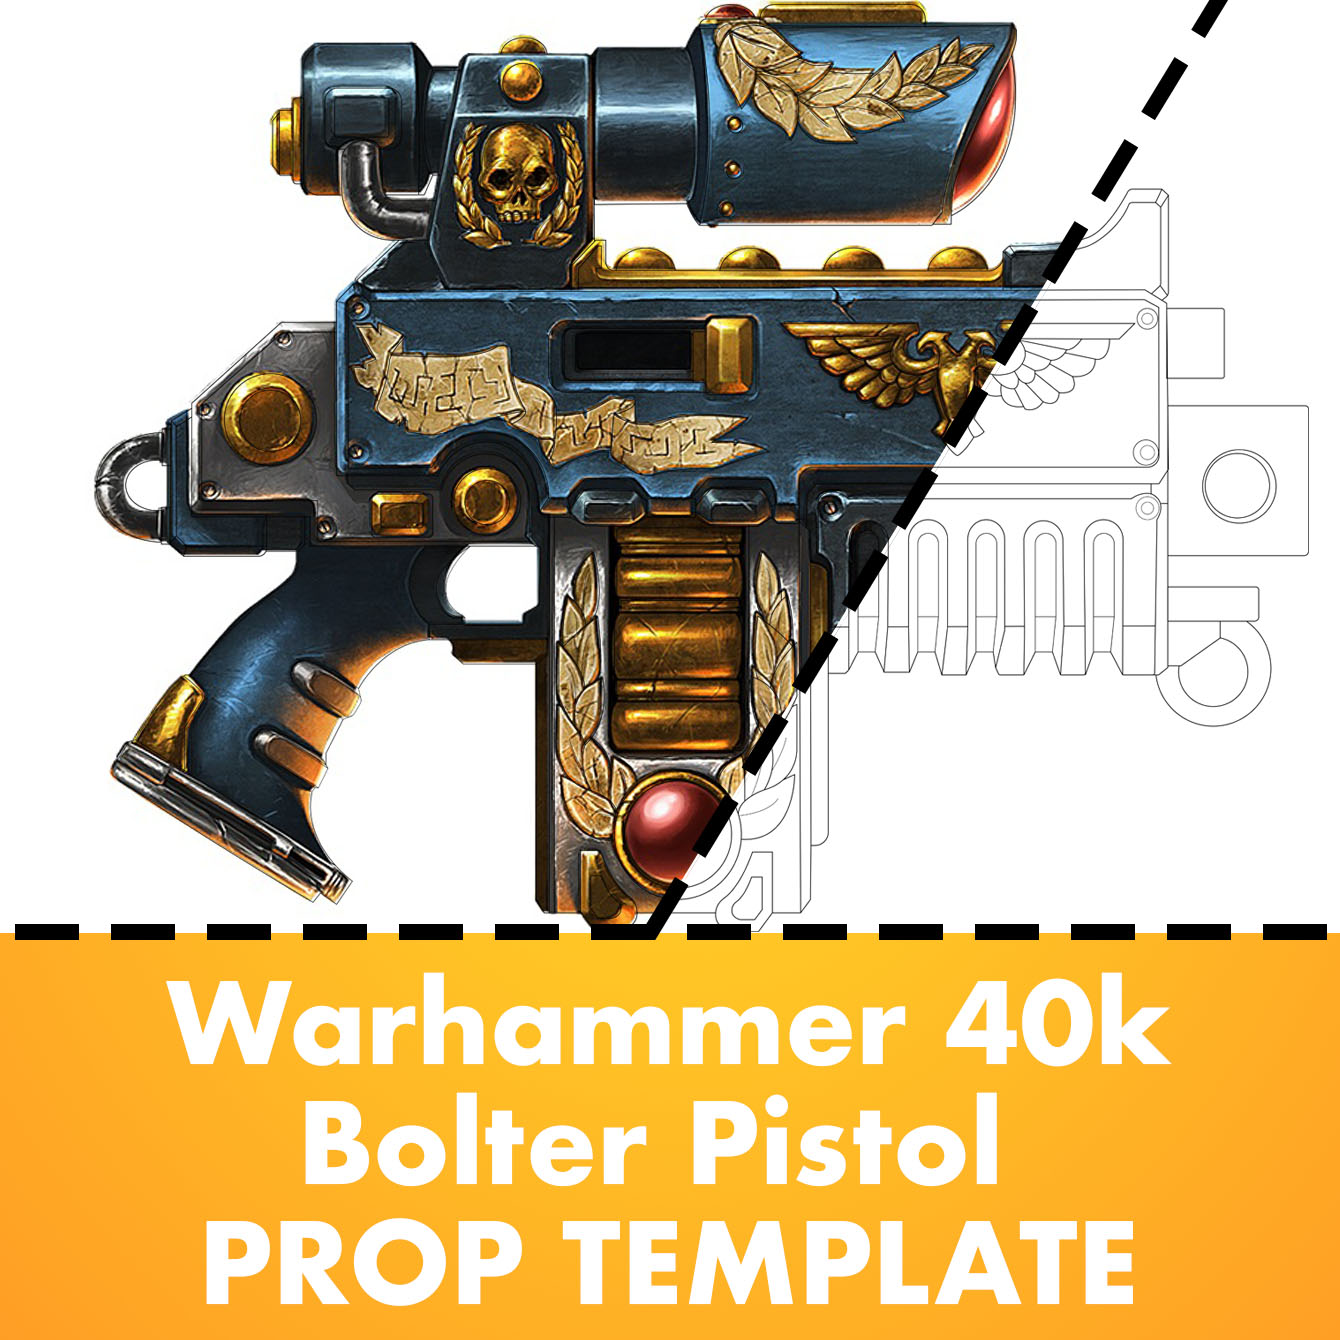 WarhammerBolterPistol_Cover.jpg